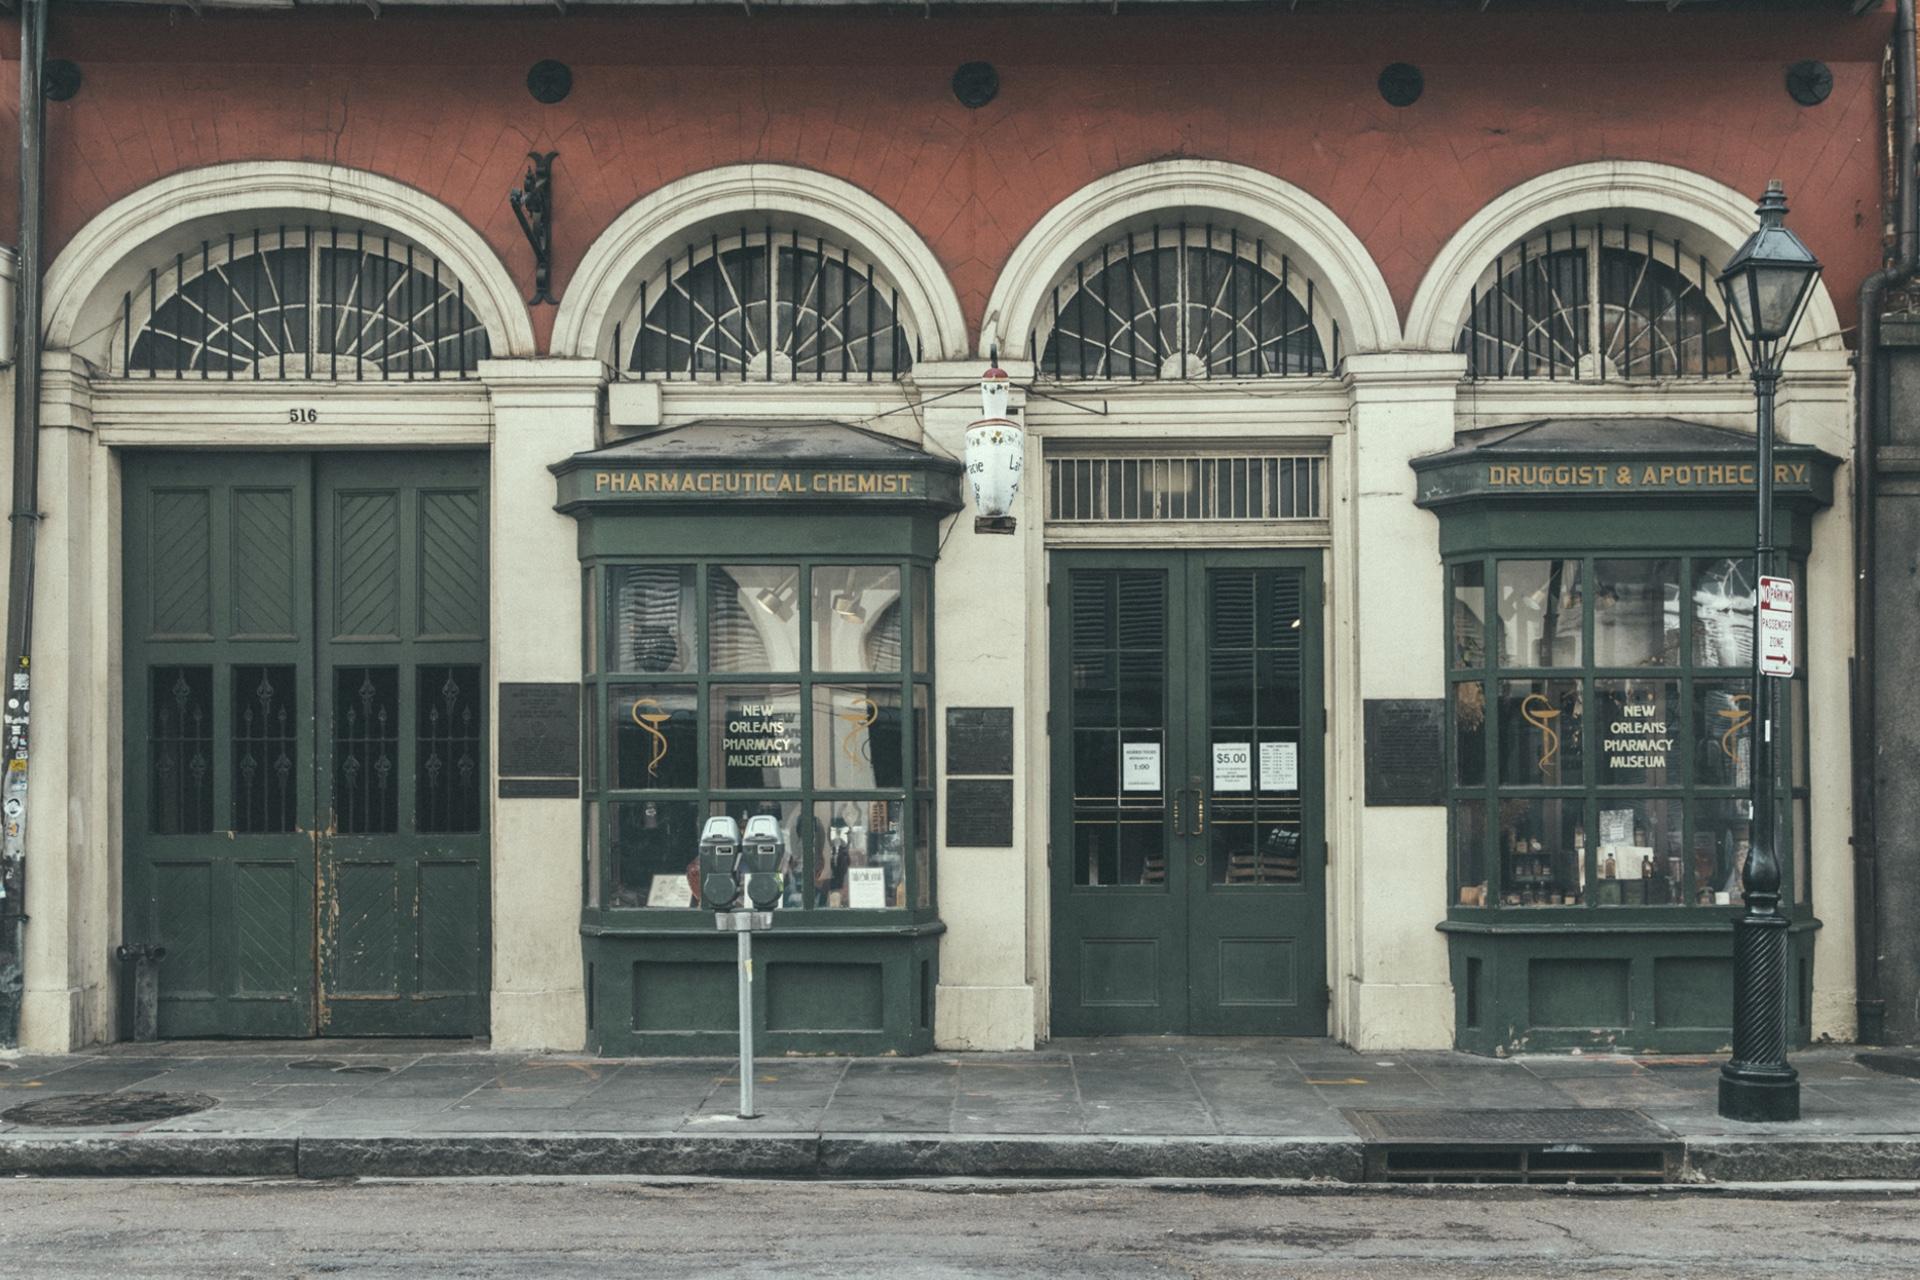 New Orleans Pharmacy facade